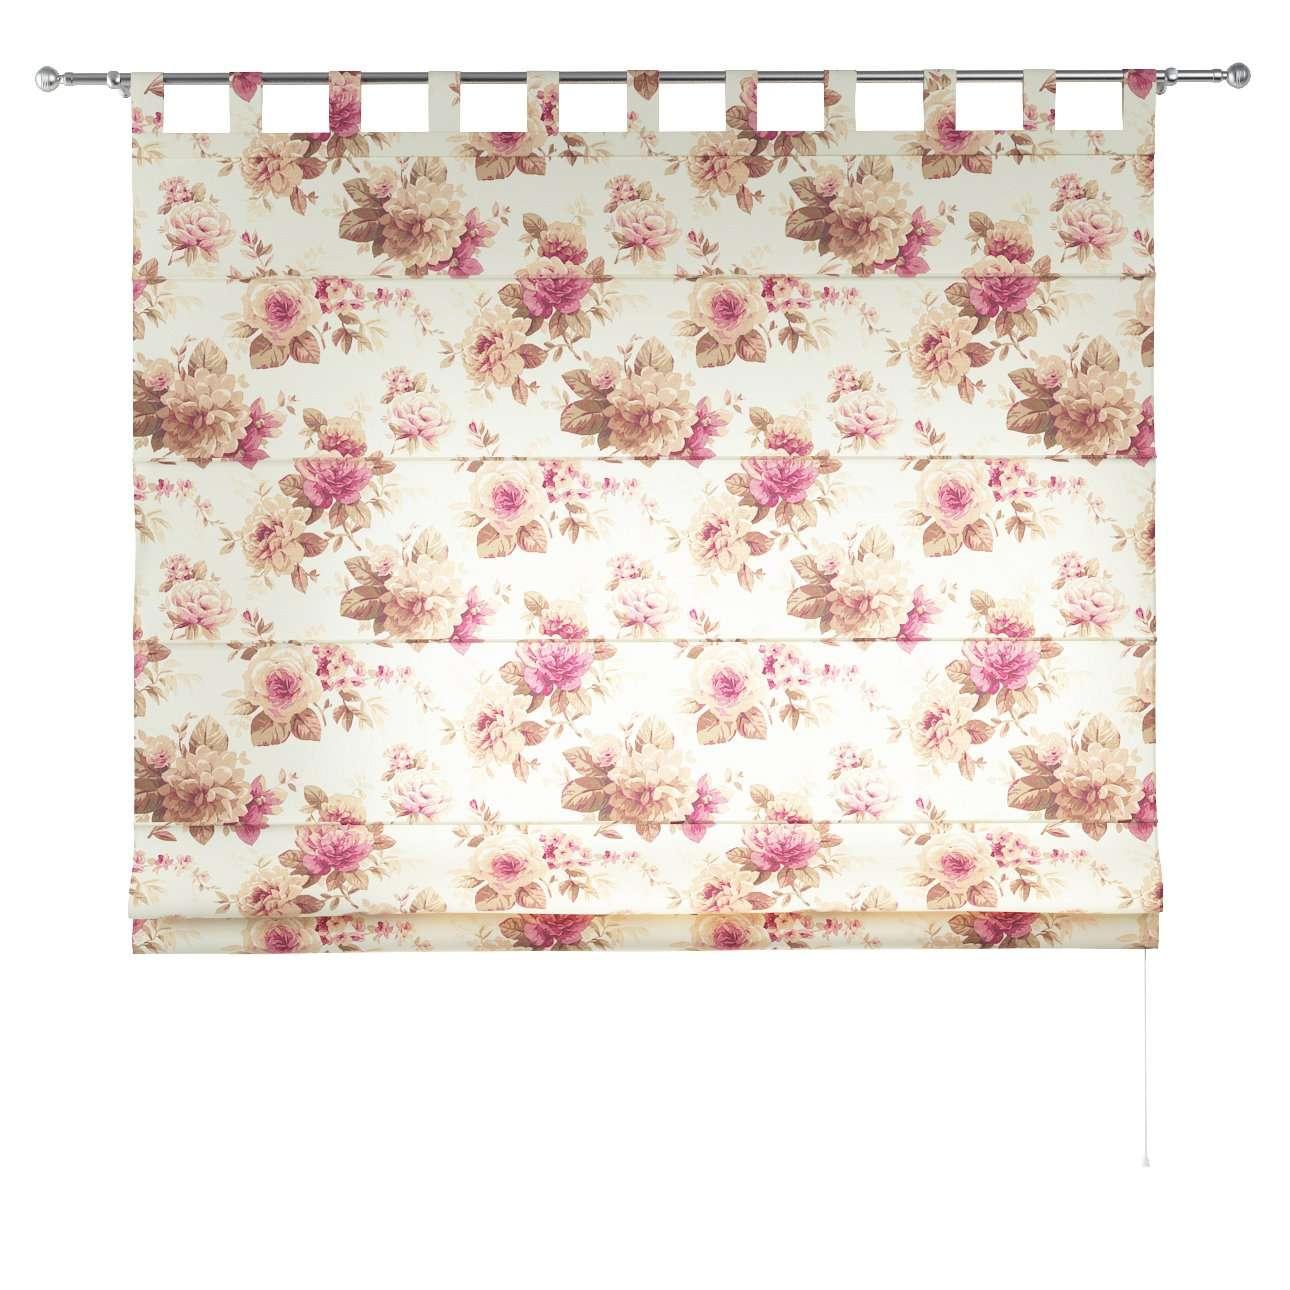 Verona tab top roman blind 80 x 170 cm (31.5 x 67 inch) in collection Mirella, fabric: 141-06